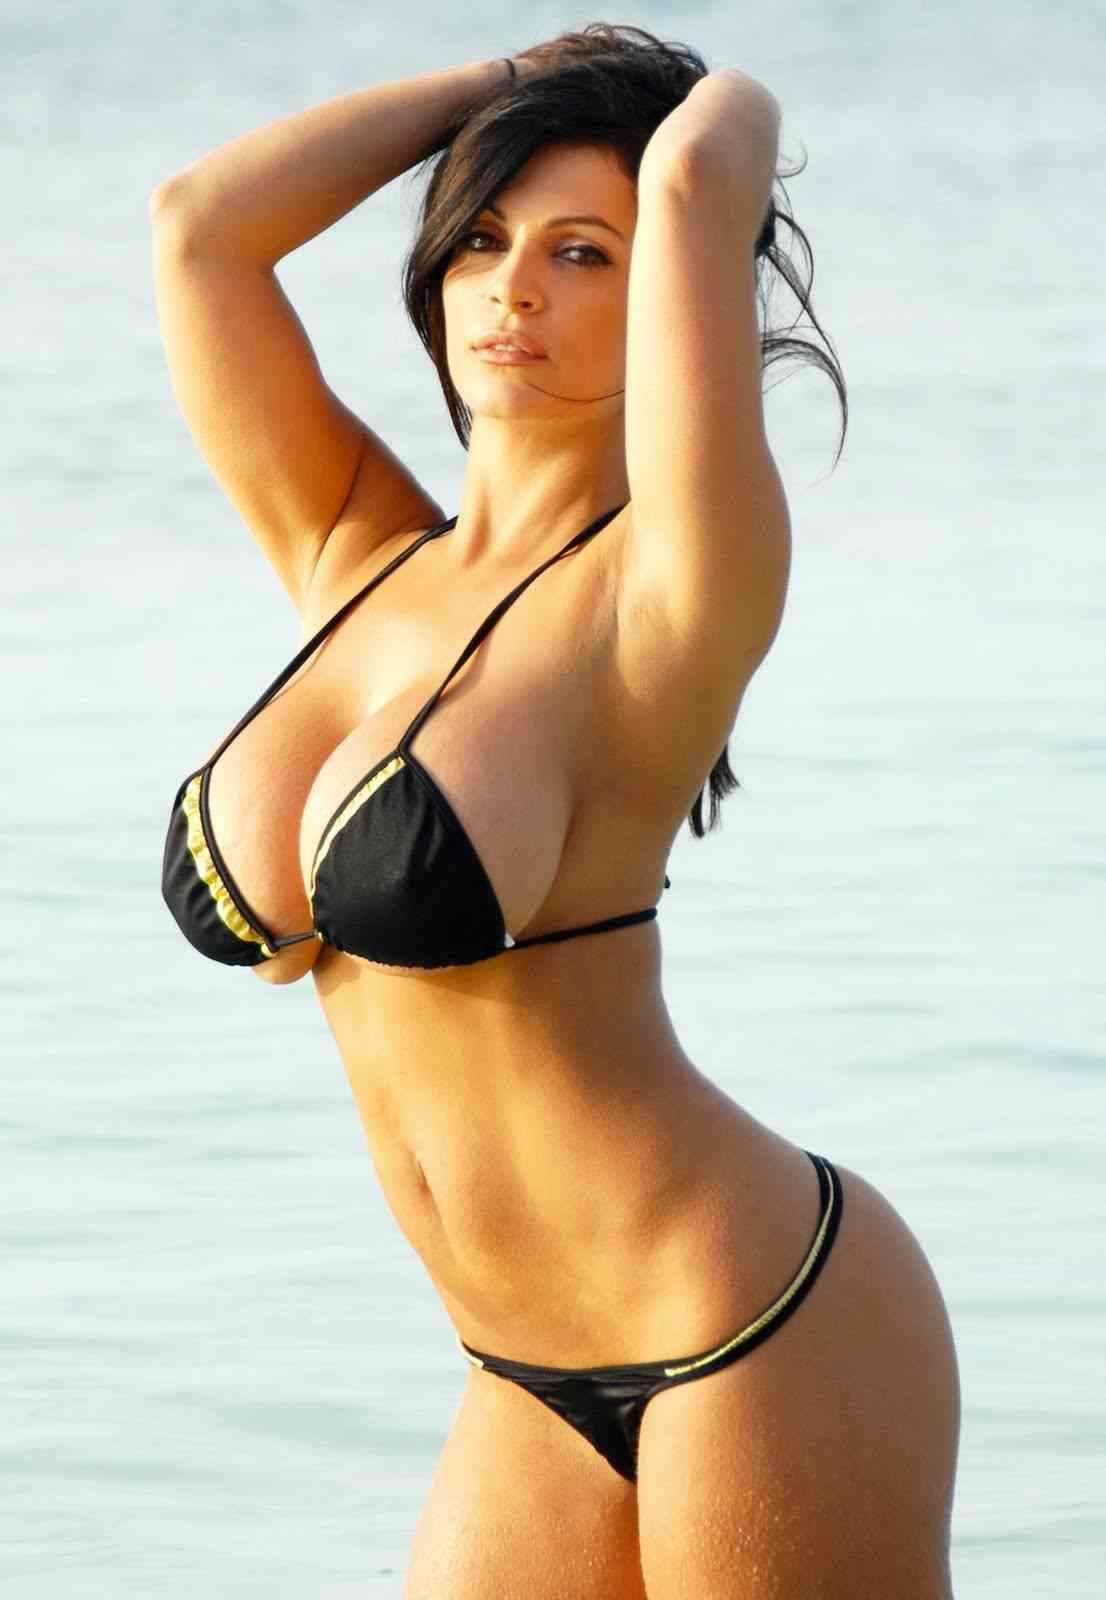 Consider, that Denise milani hot bikini